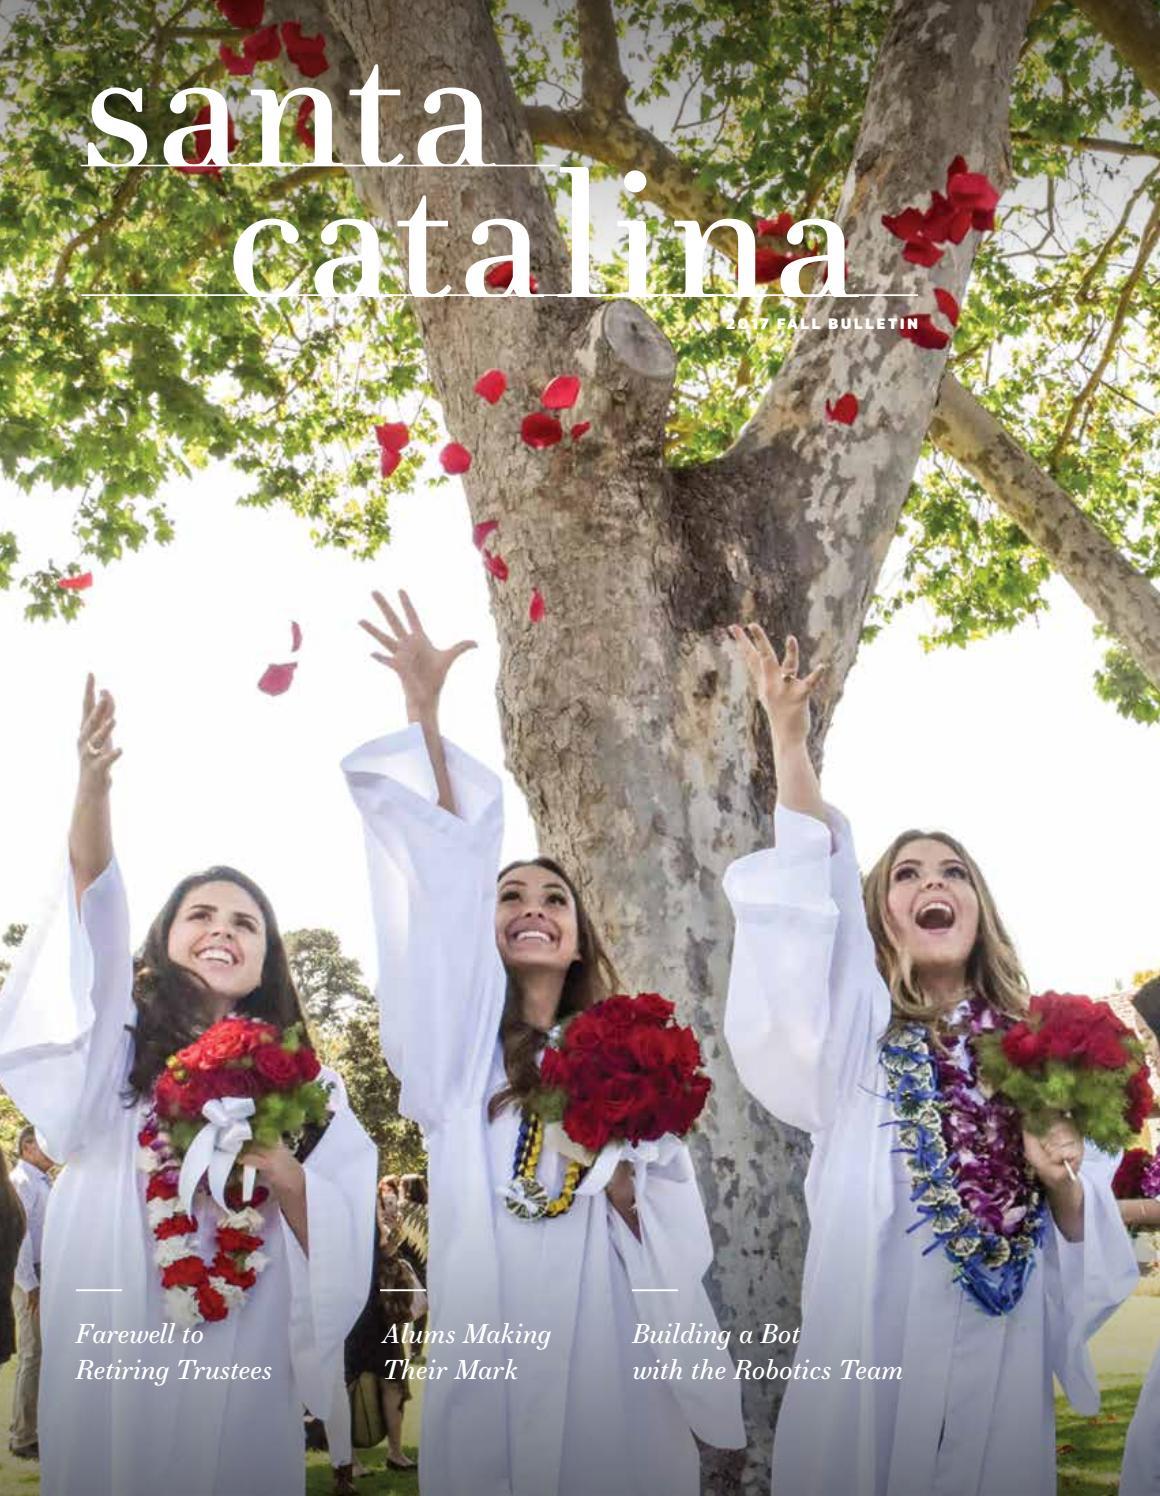 Santa Catalina School Bulletin Fall 2017 by santacatalina - issuu fb8dbea8b44